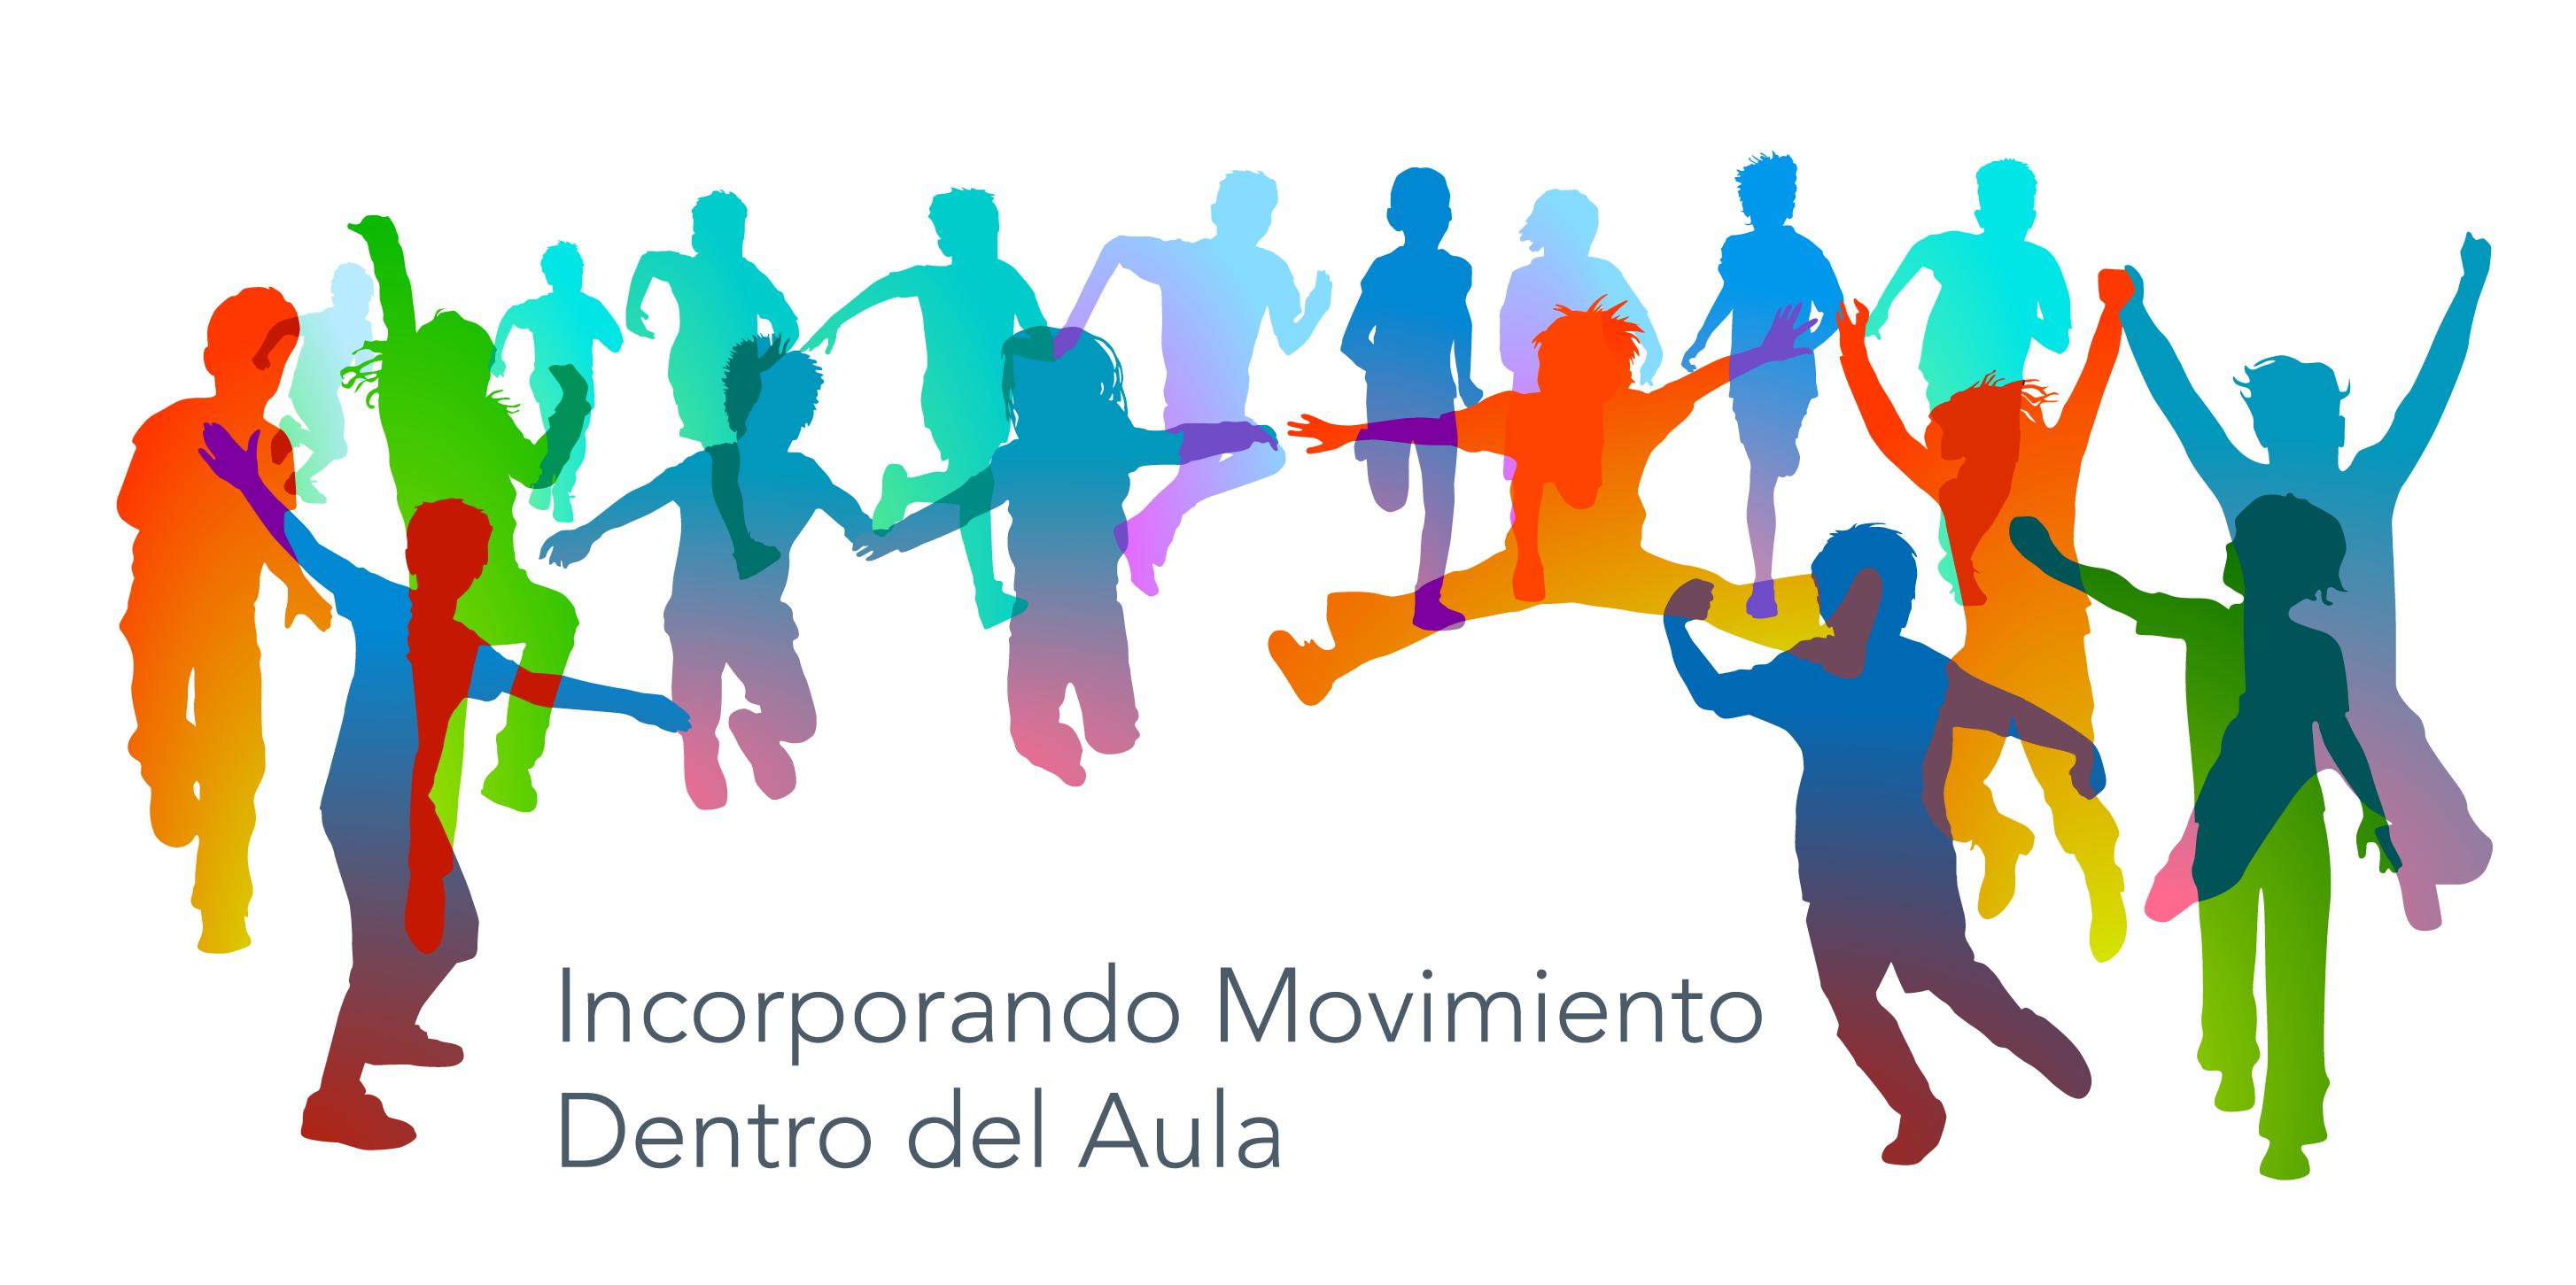 IncorporandoMovimientoDentroDelAula.png